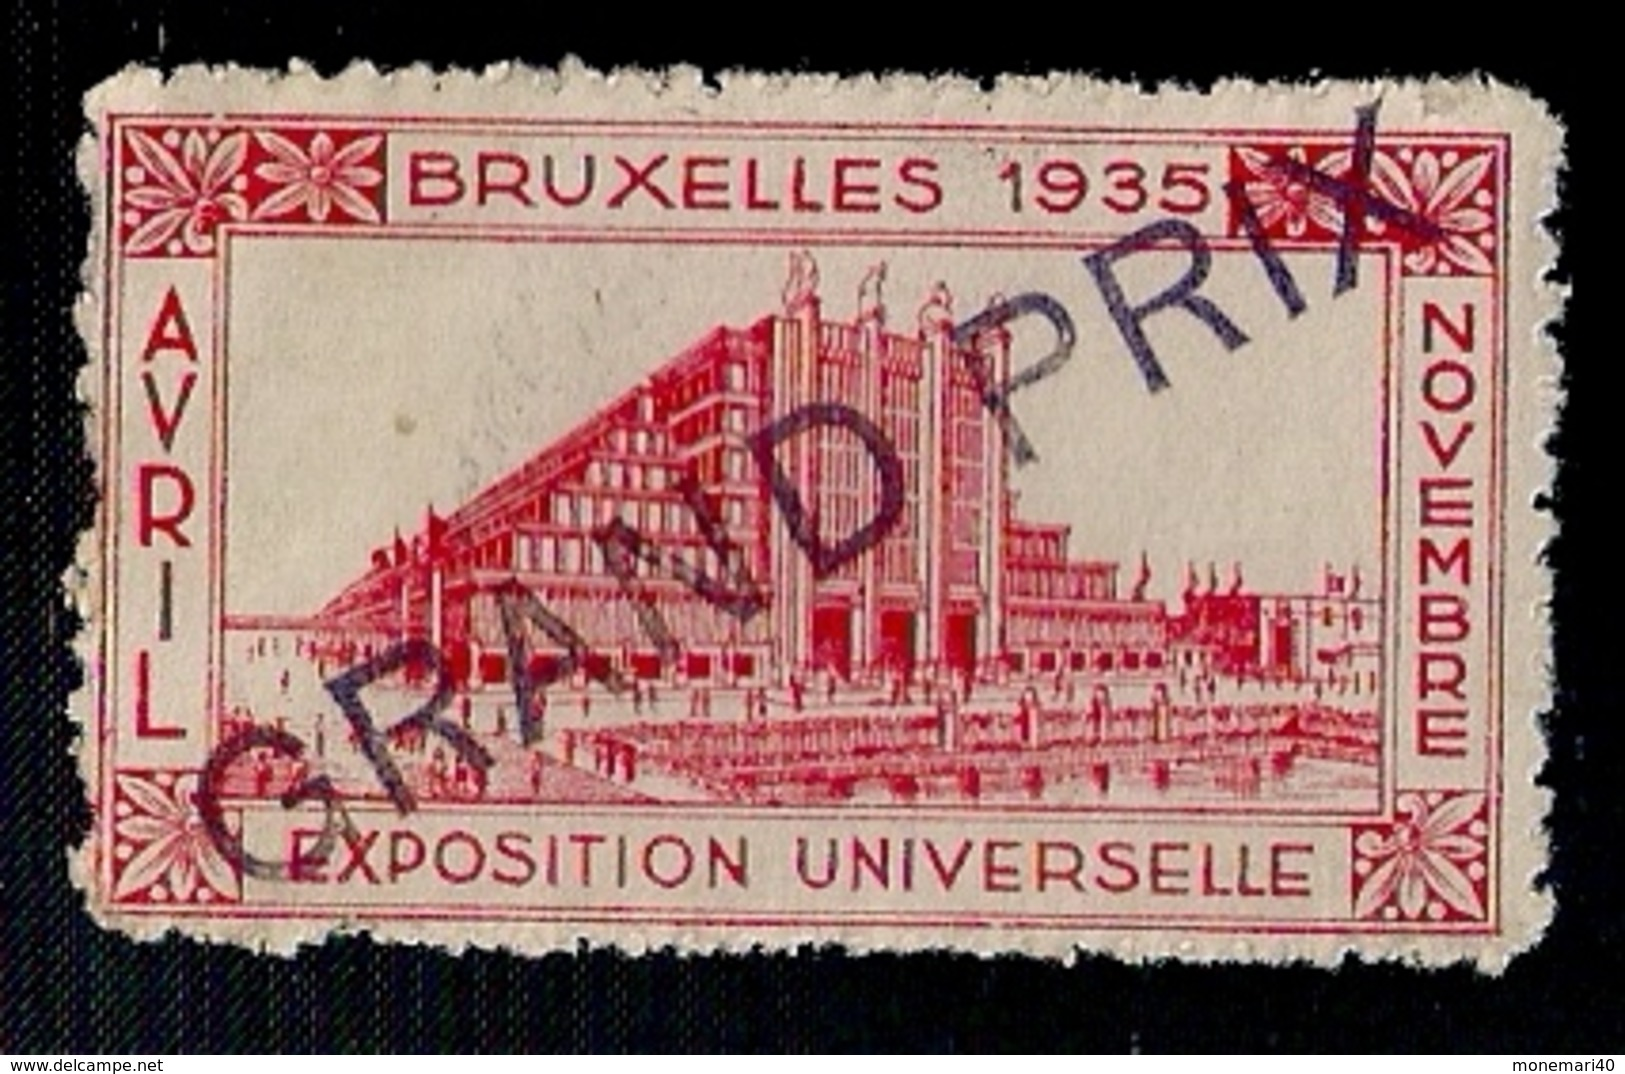 BELGIQUE - VIGNETTE - EXPOSITION UNIVERSELLE - BRUXLLES 1935 - GRAND PRIX. - 1935 – Brüssel (Belgien)